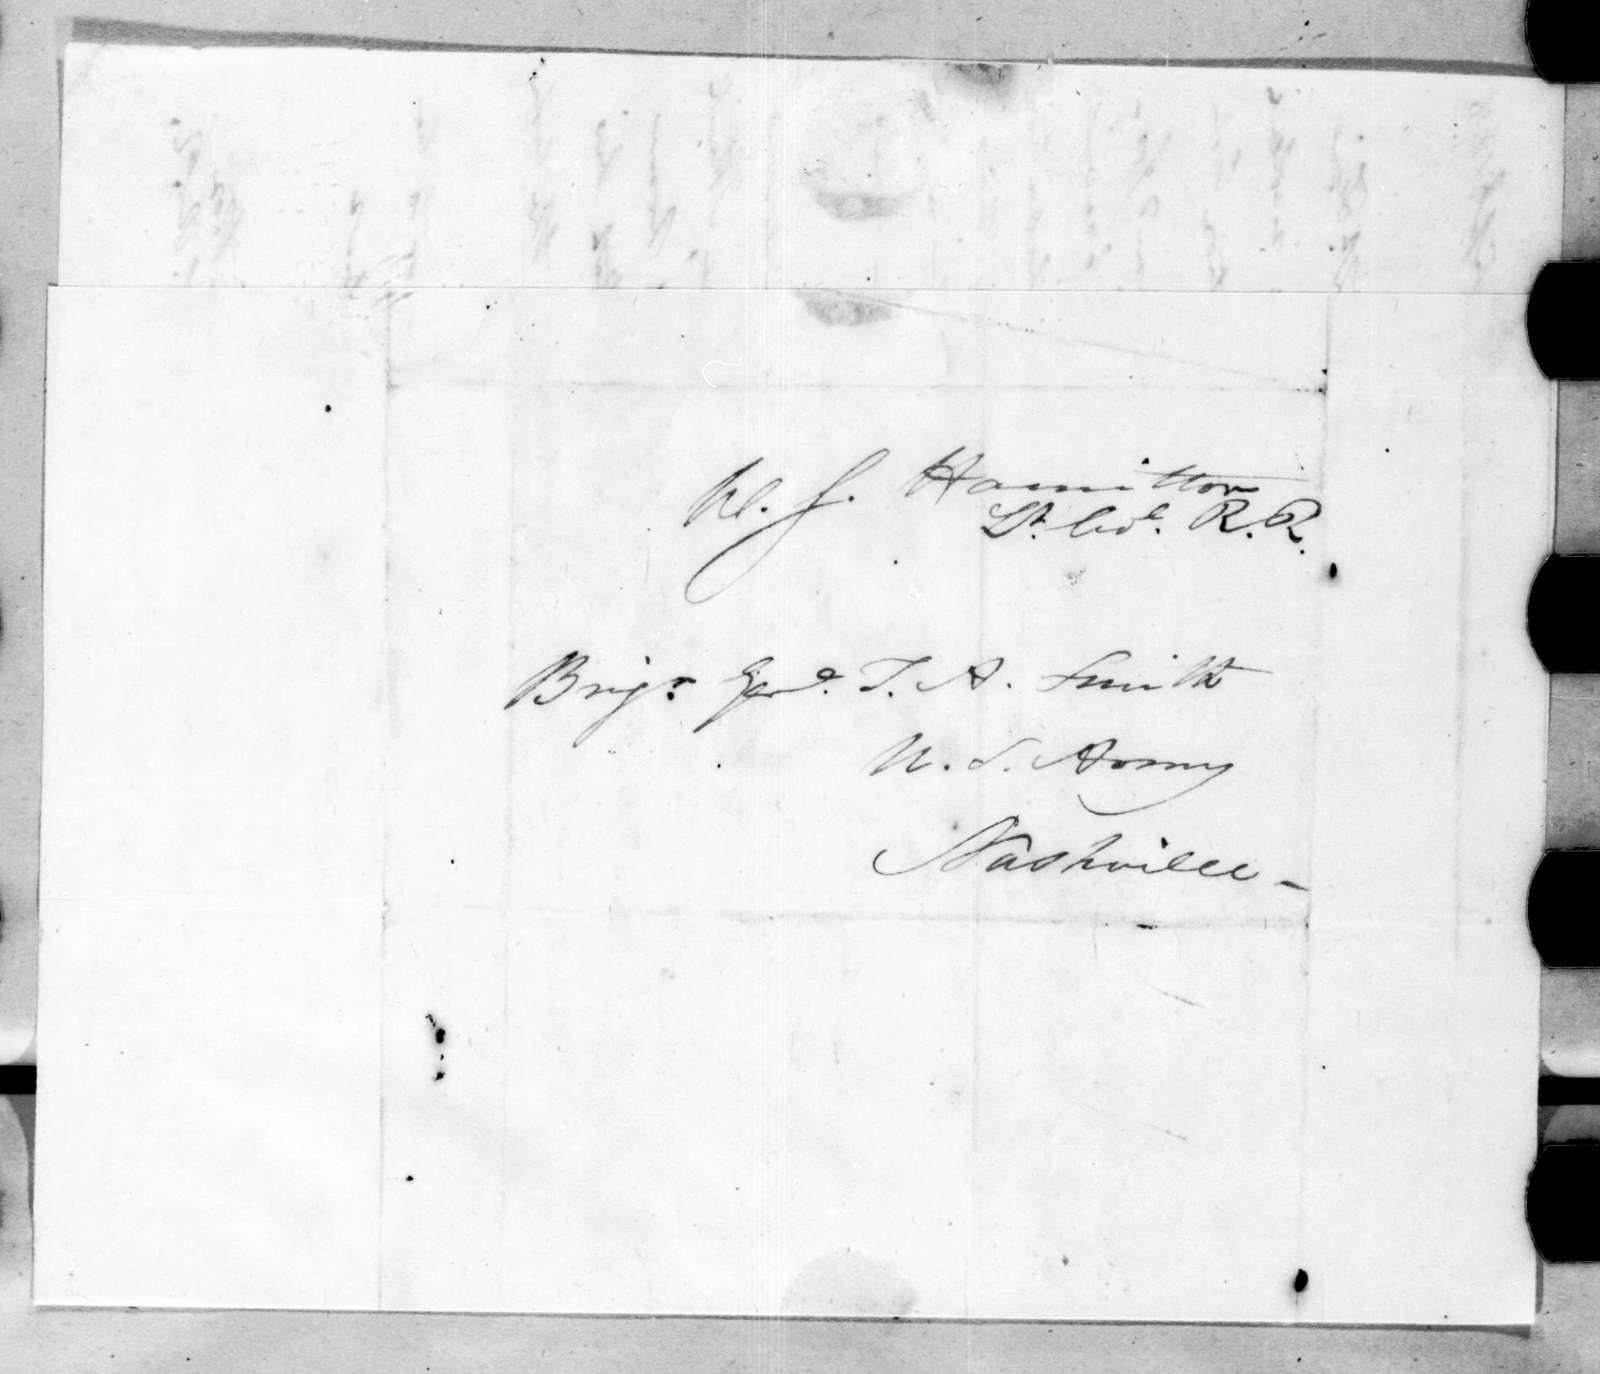 William Southerland Hamilton to Thomas Adams Smith, September 3, 1816